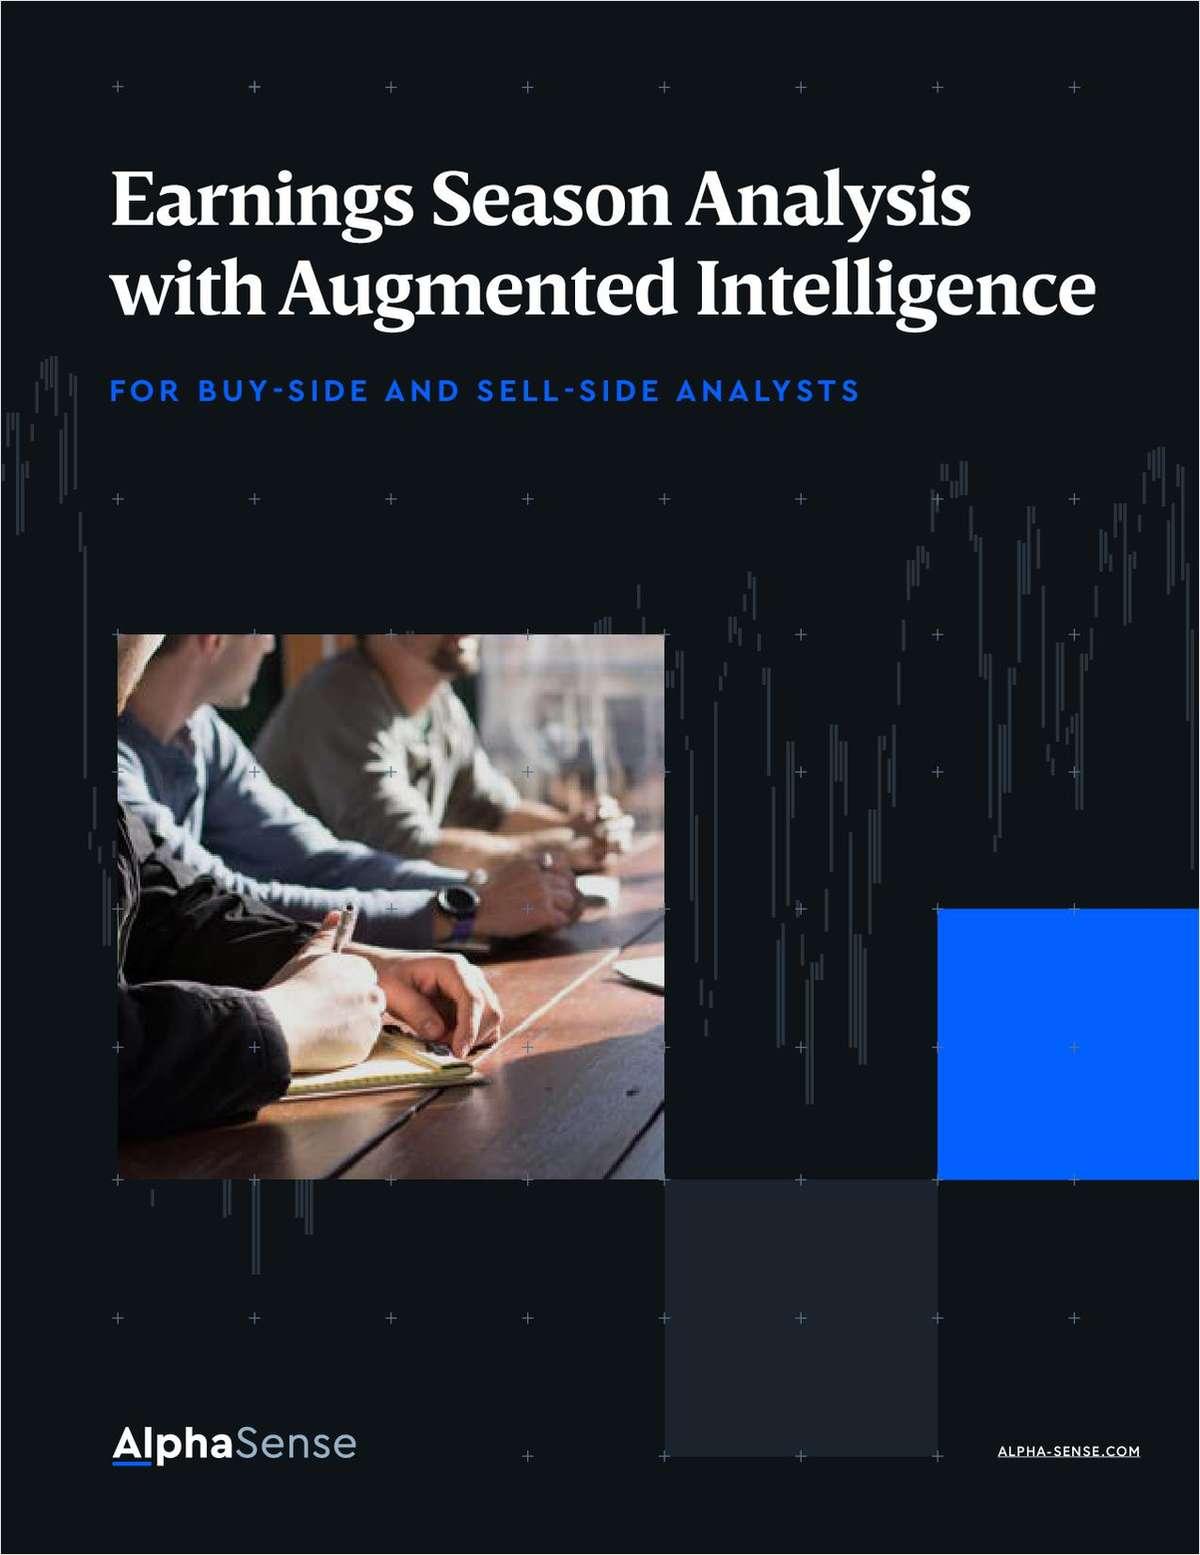 Earnings Season Analysis with Augmented Intelligence